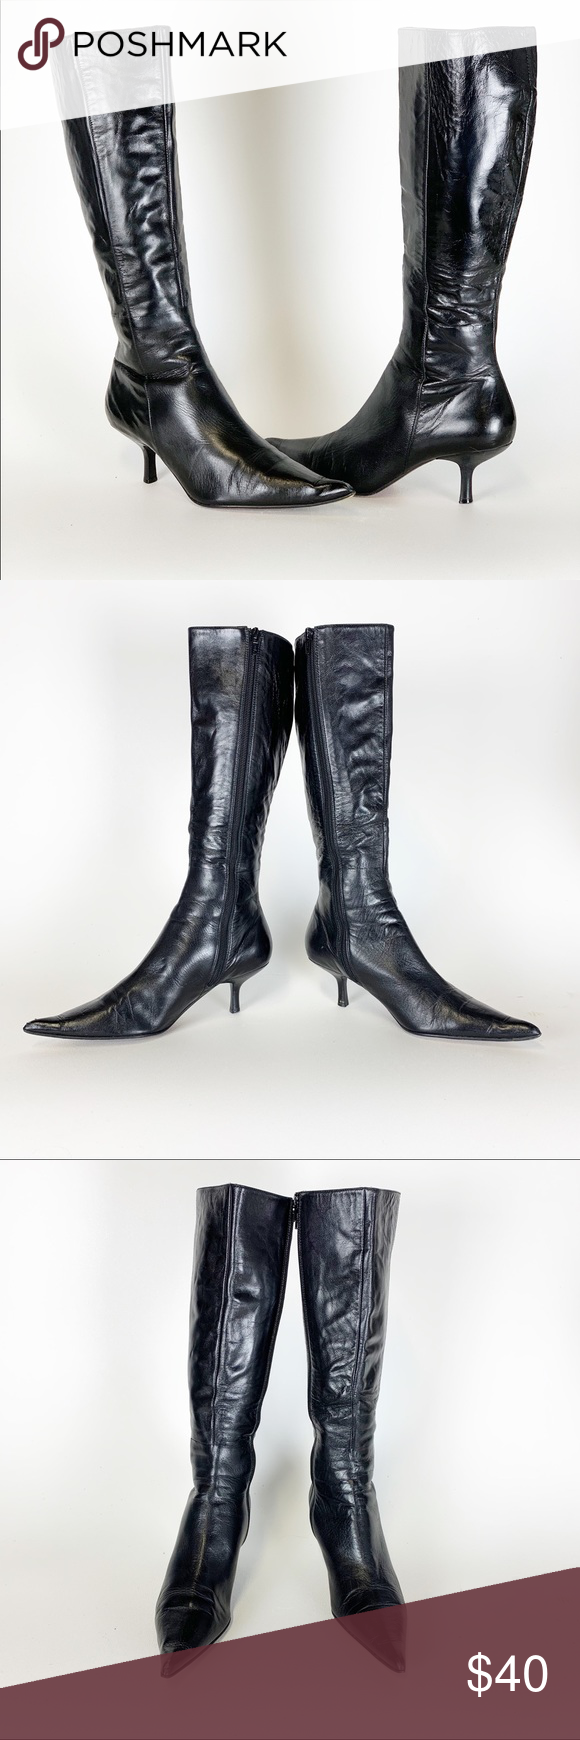 Leather boots, Kitten heel boots, Boots